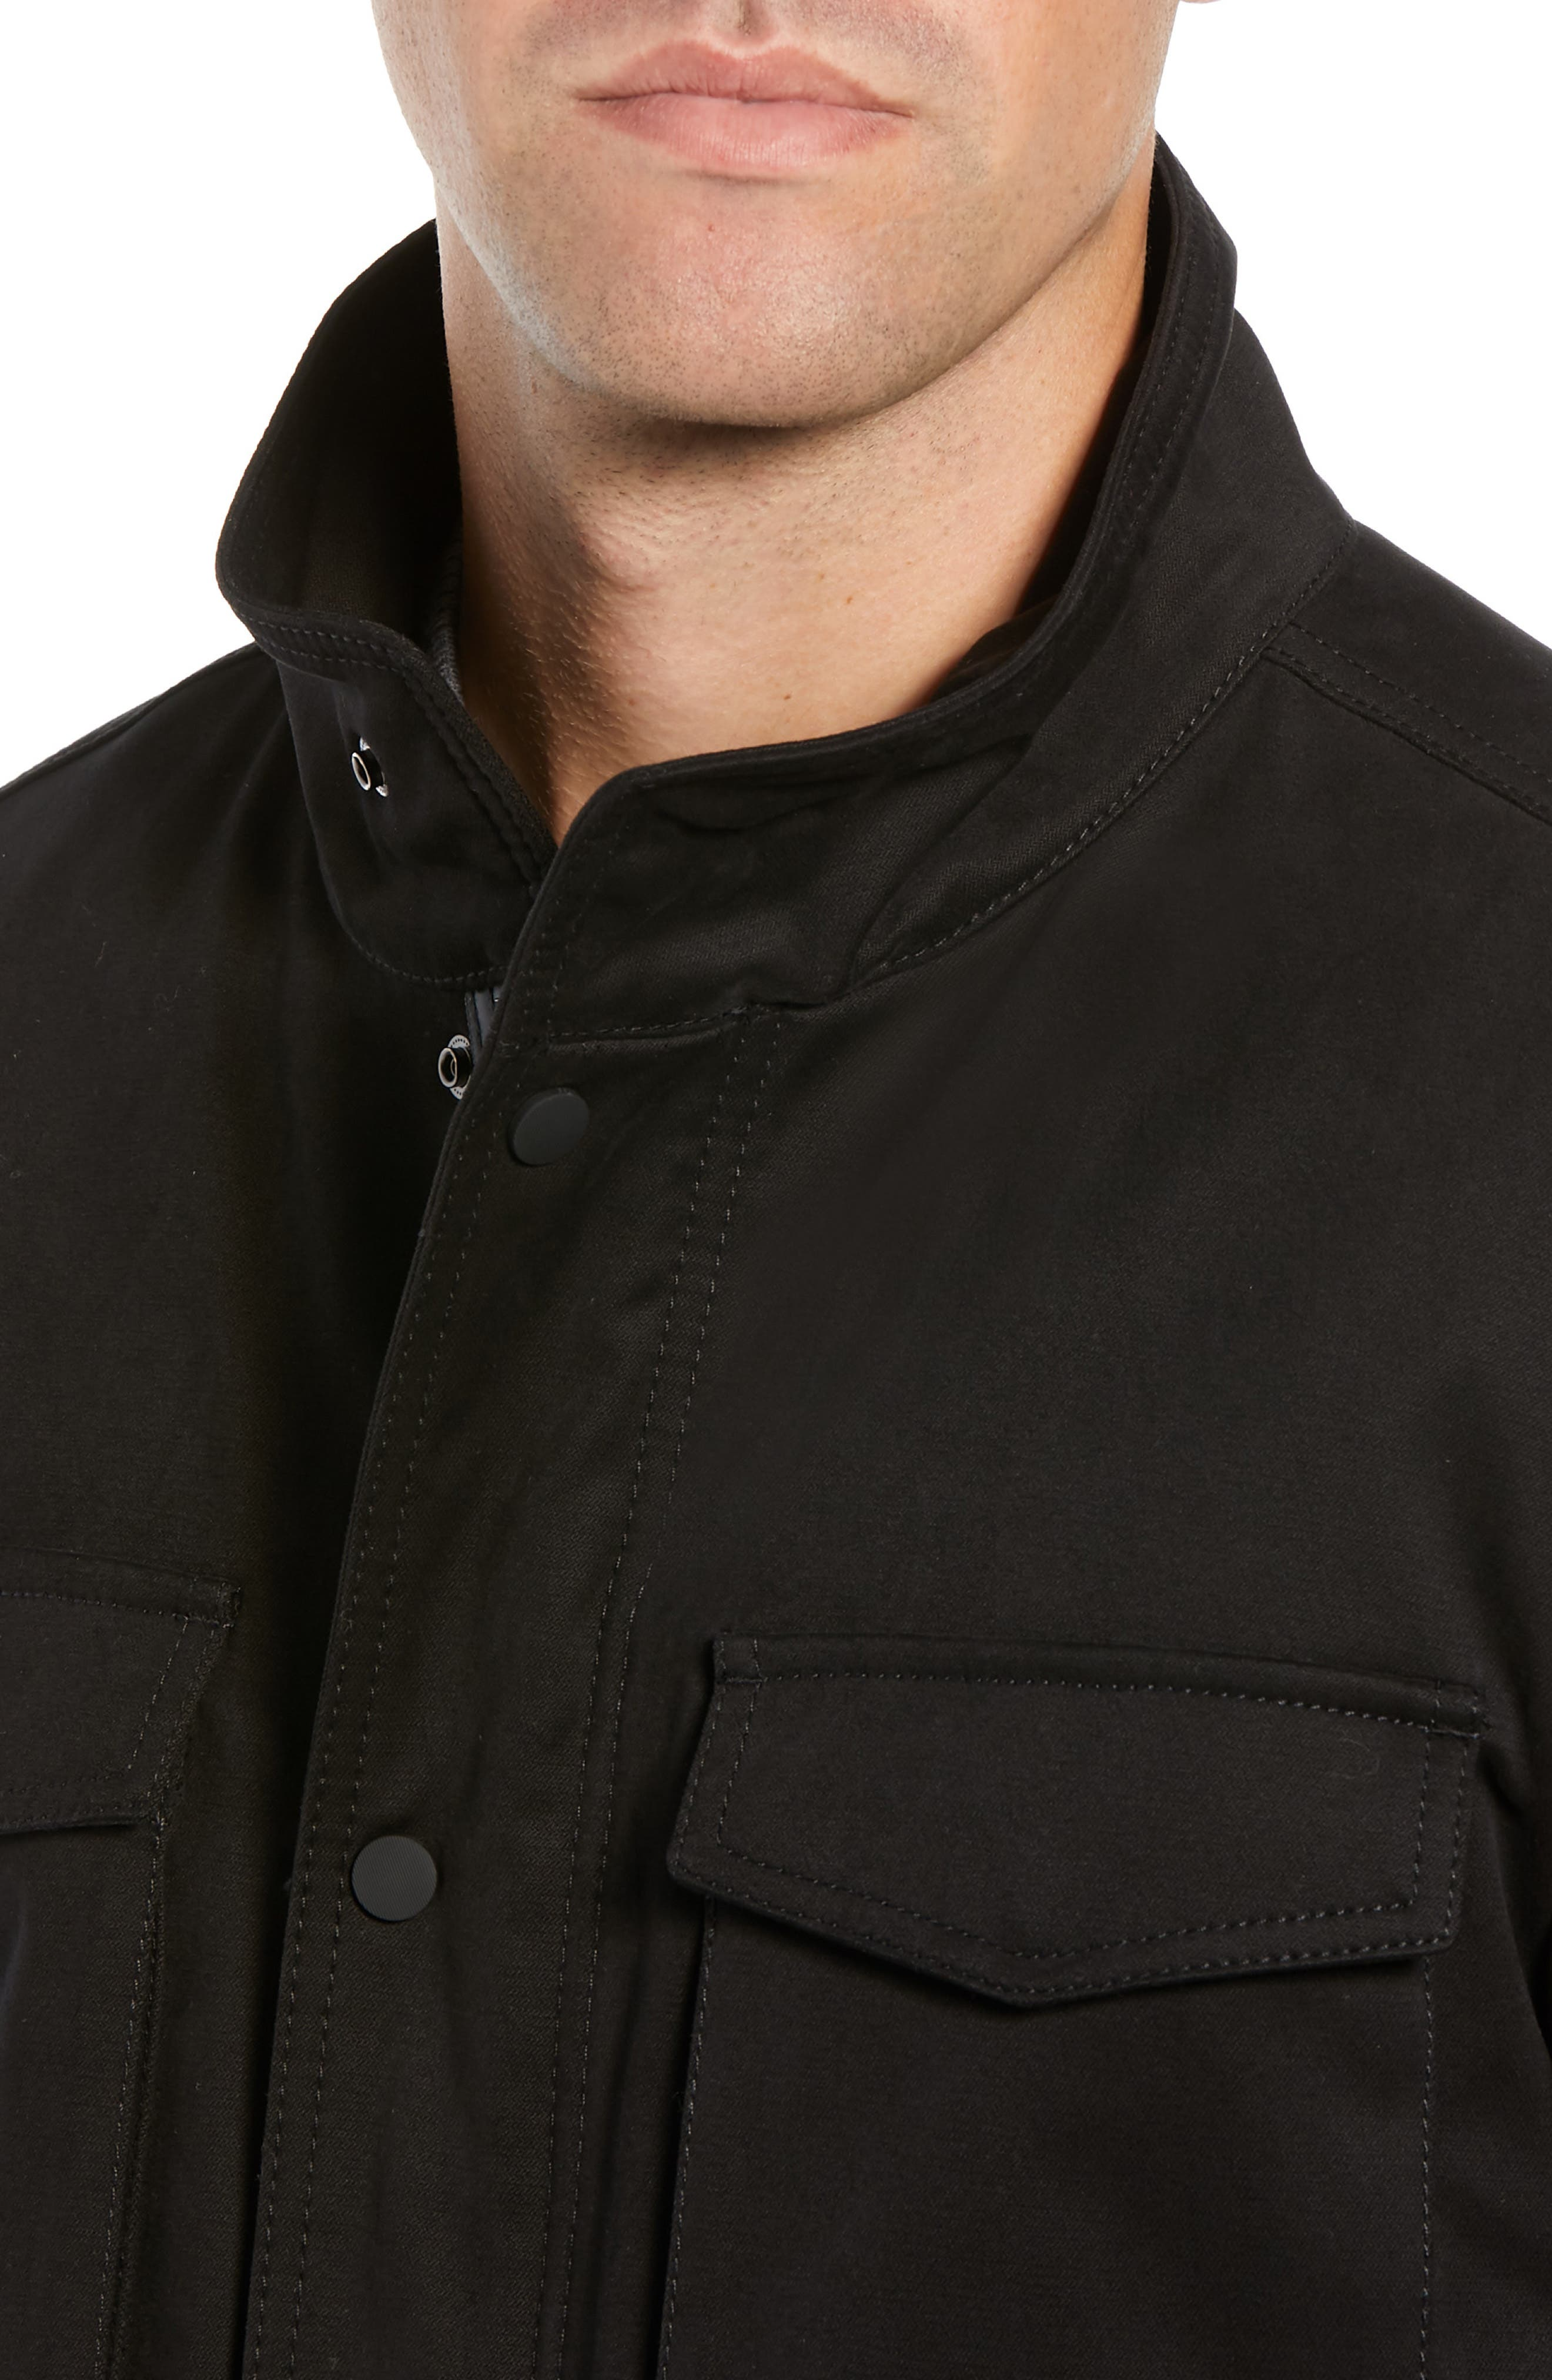 Oroy Regular Fit Field Jacket,                             Alternate thumbnail 4, color,                             BLACK